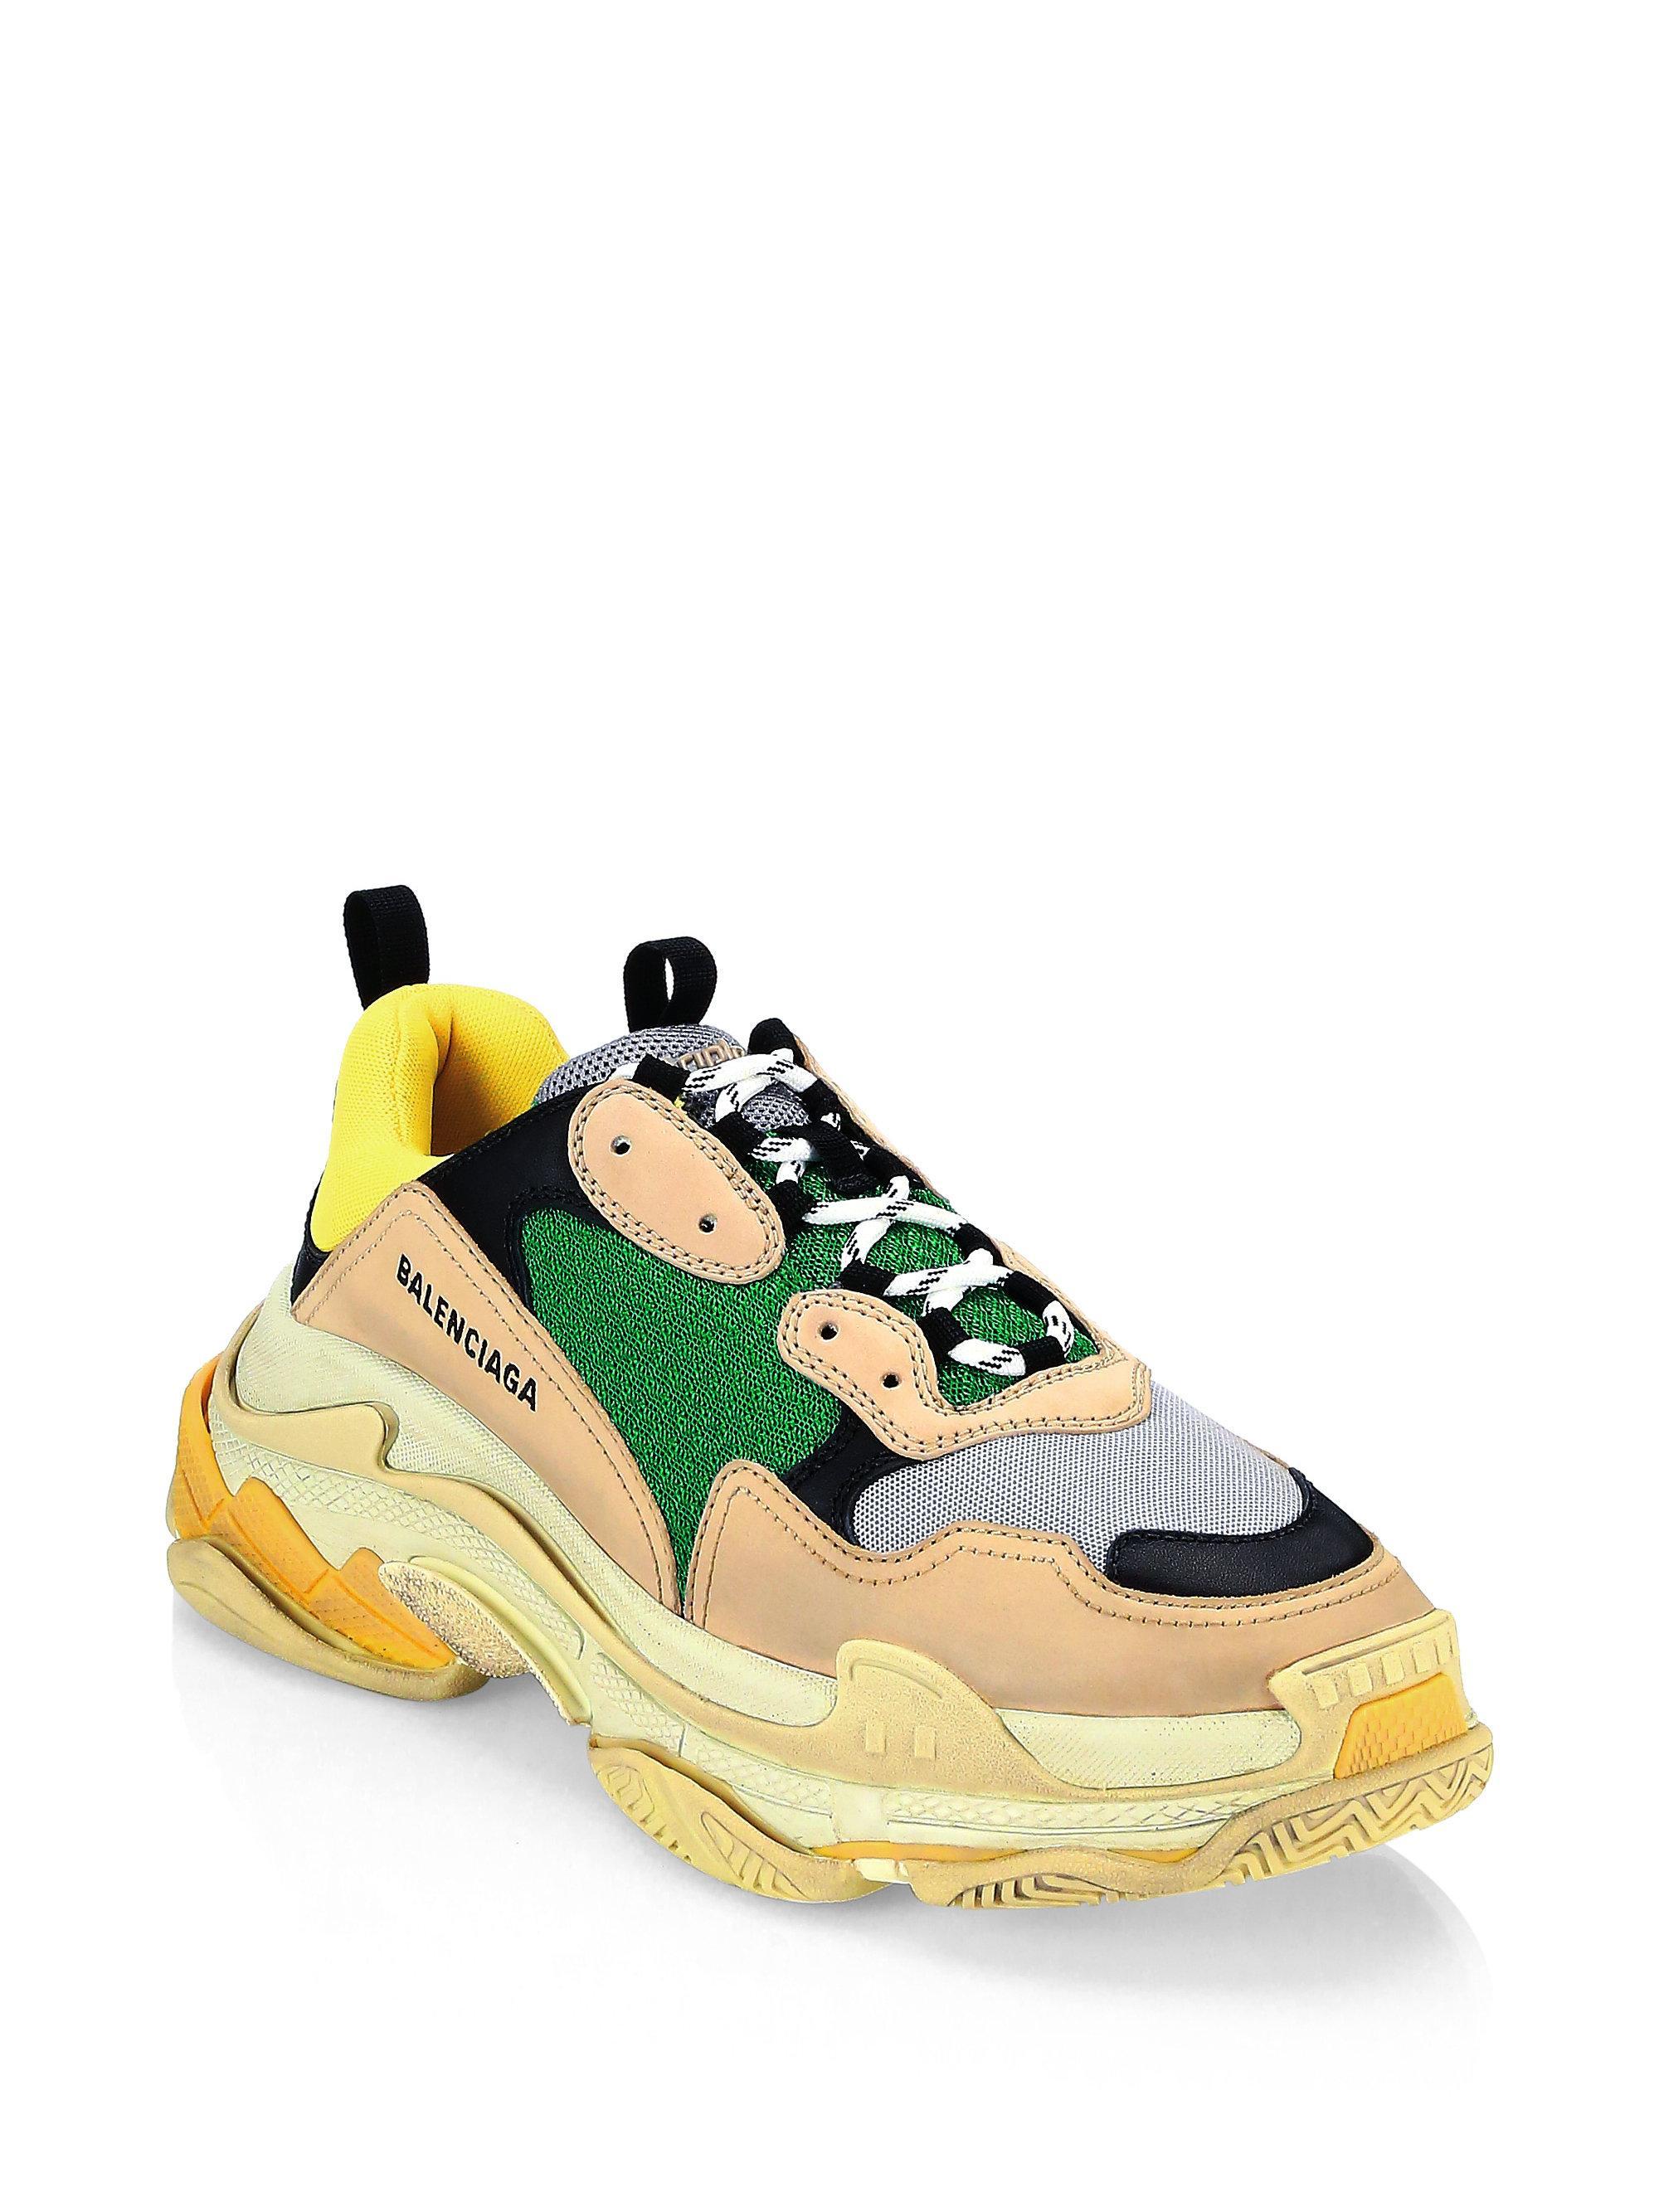 Balenciaga Triple S Suede & Mesh Paneled Sneakers KnDMVCbO